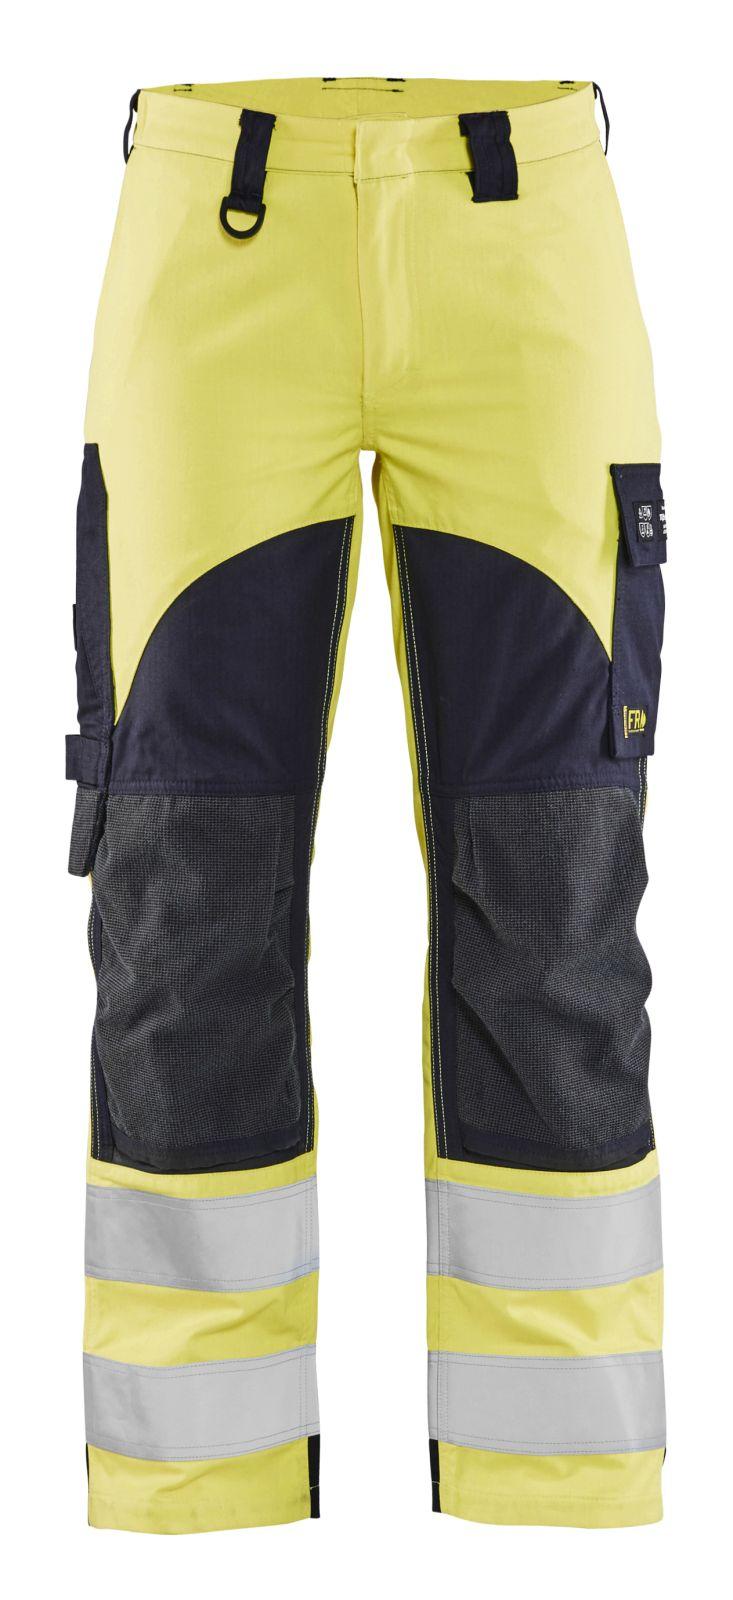 Blaklader Broeken 71891512 Multinorm fluo geel-marineblauw(3389)